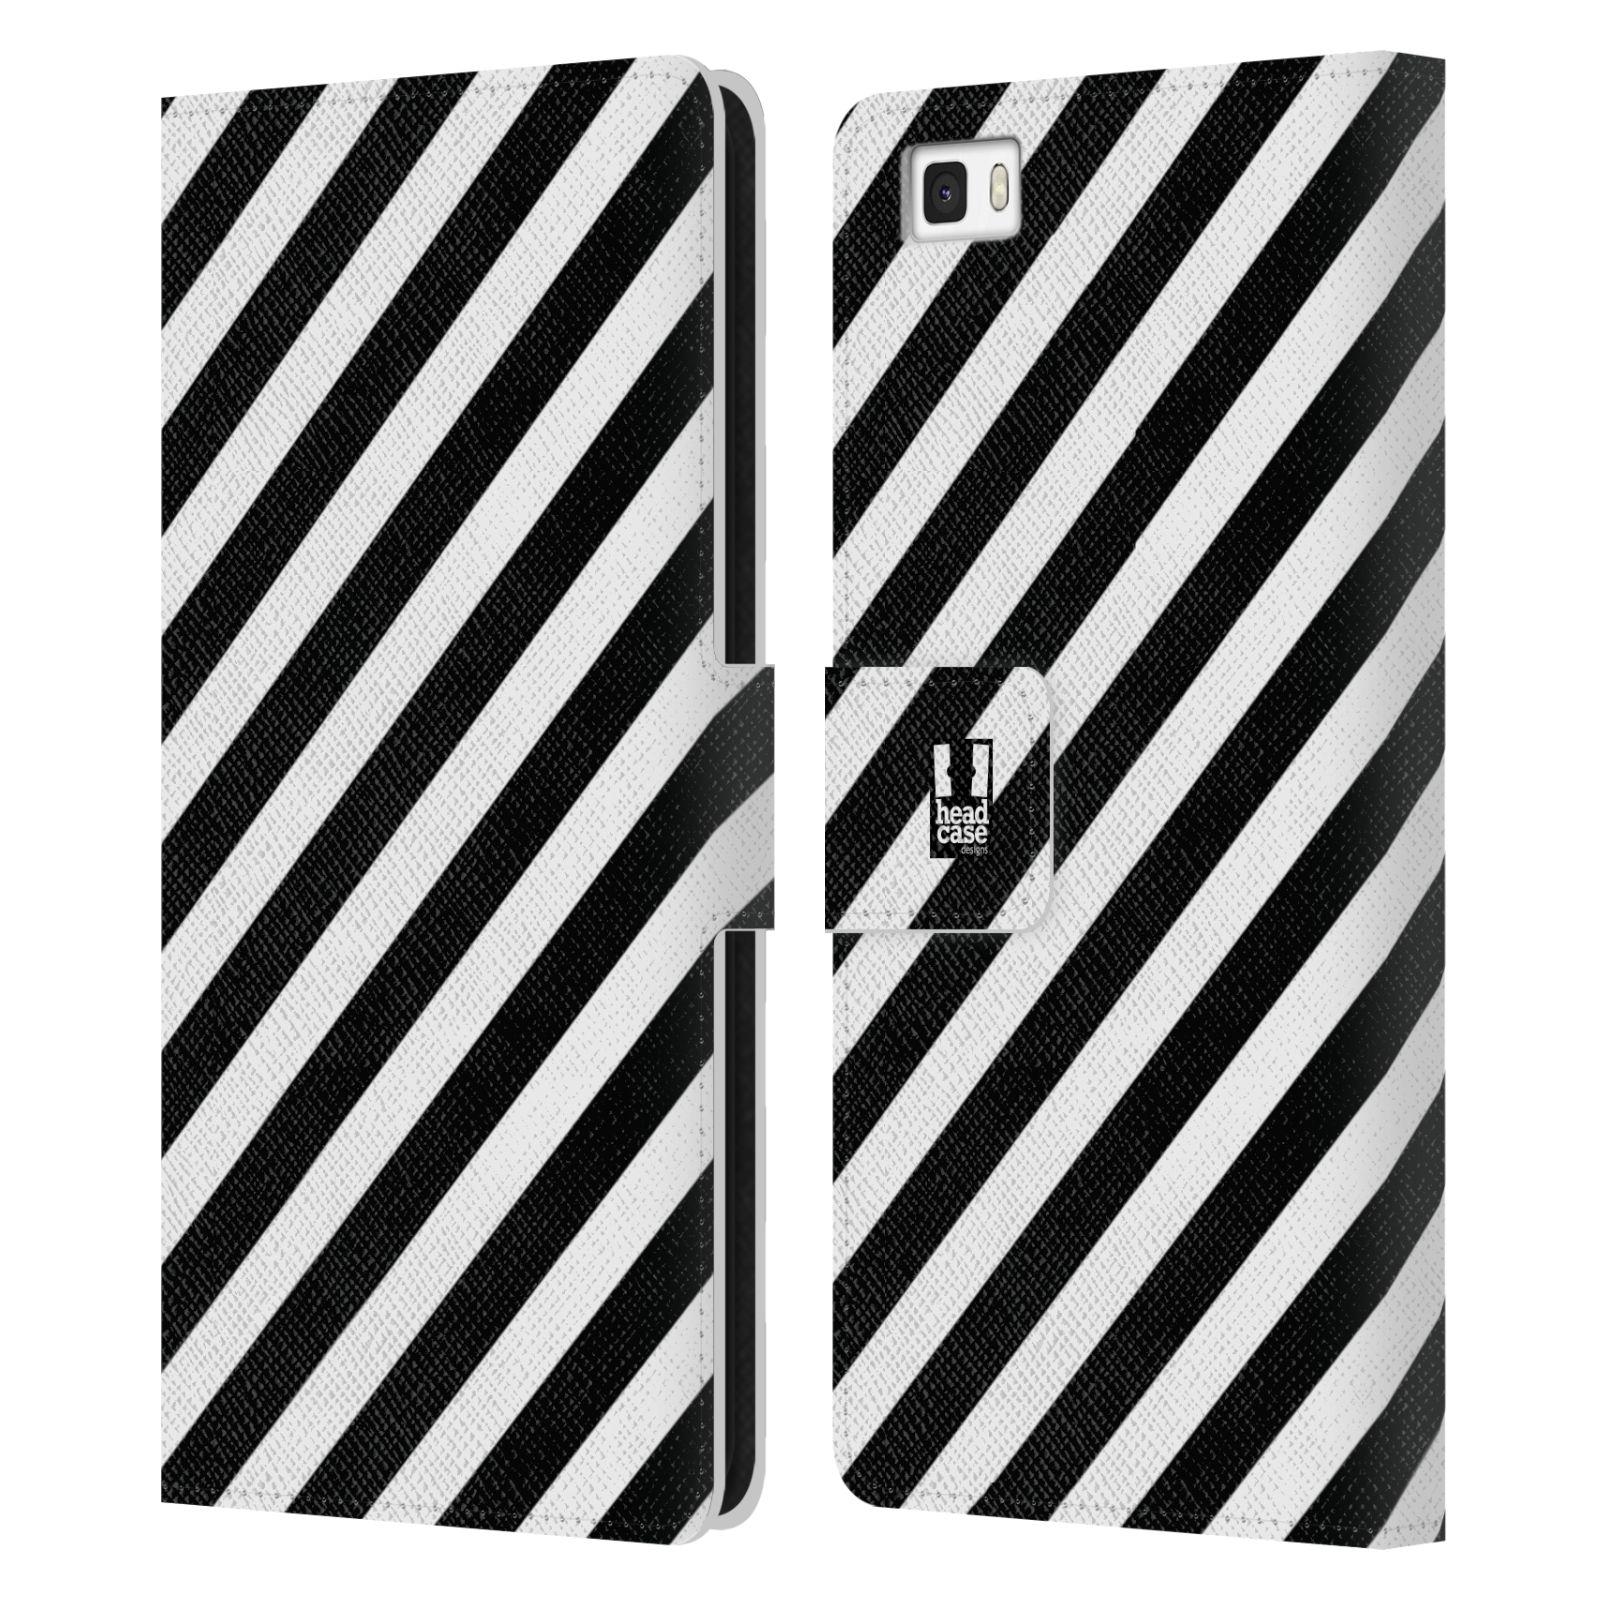 HEAD CASE Flipové pouzdro pro mobil Huawei P8 LITE ČERNÁ A BÍLÁ zebra pruhy